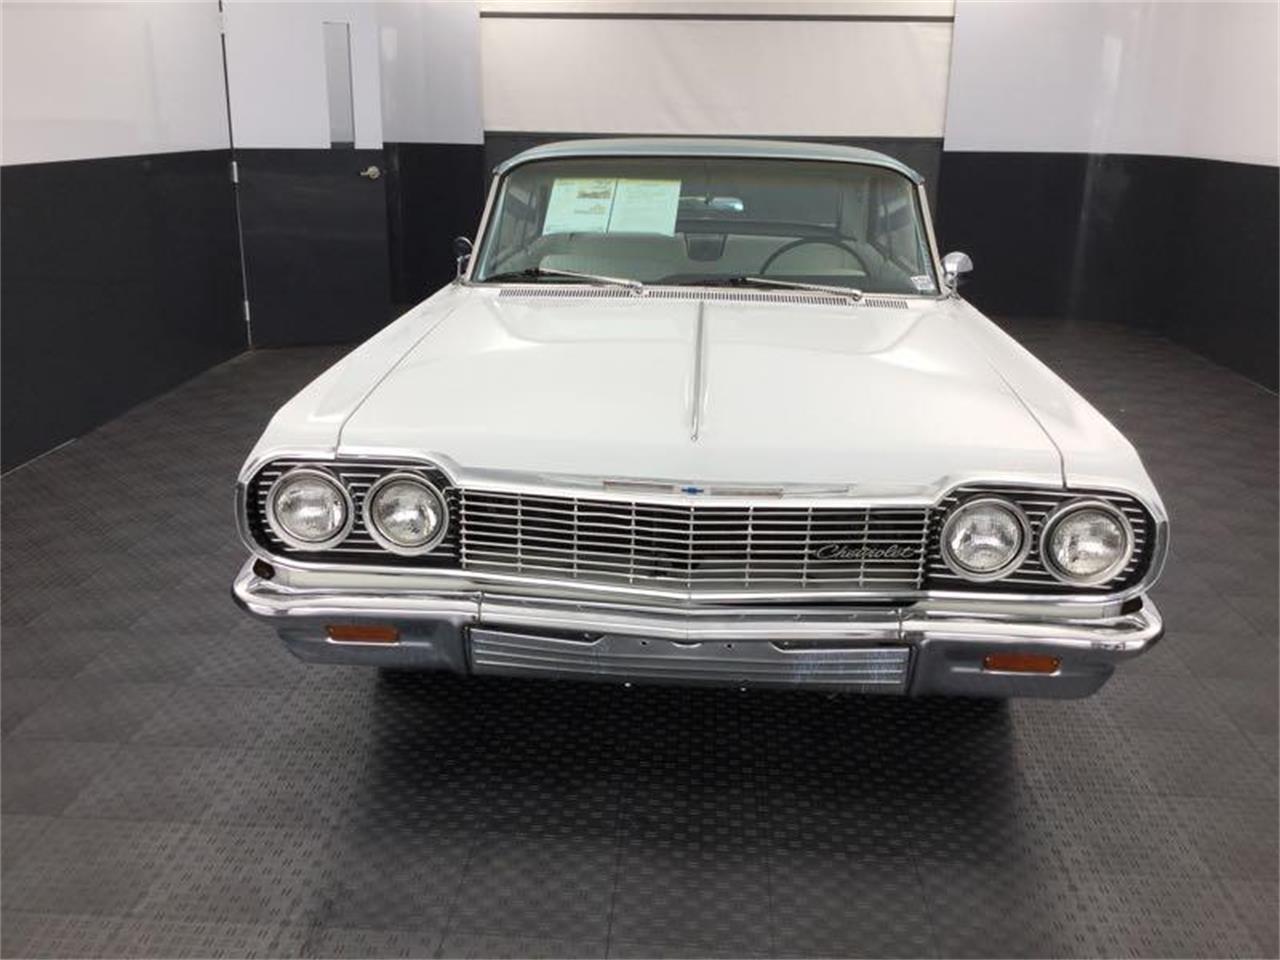 1964 Chevrolet Impala SS (CC-1262125) for sale in Richmond, Virginia